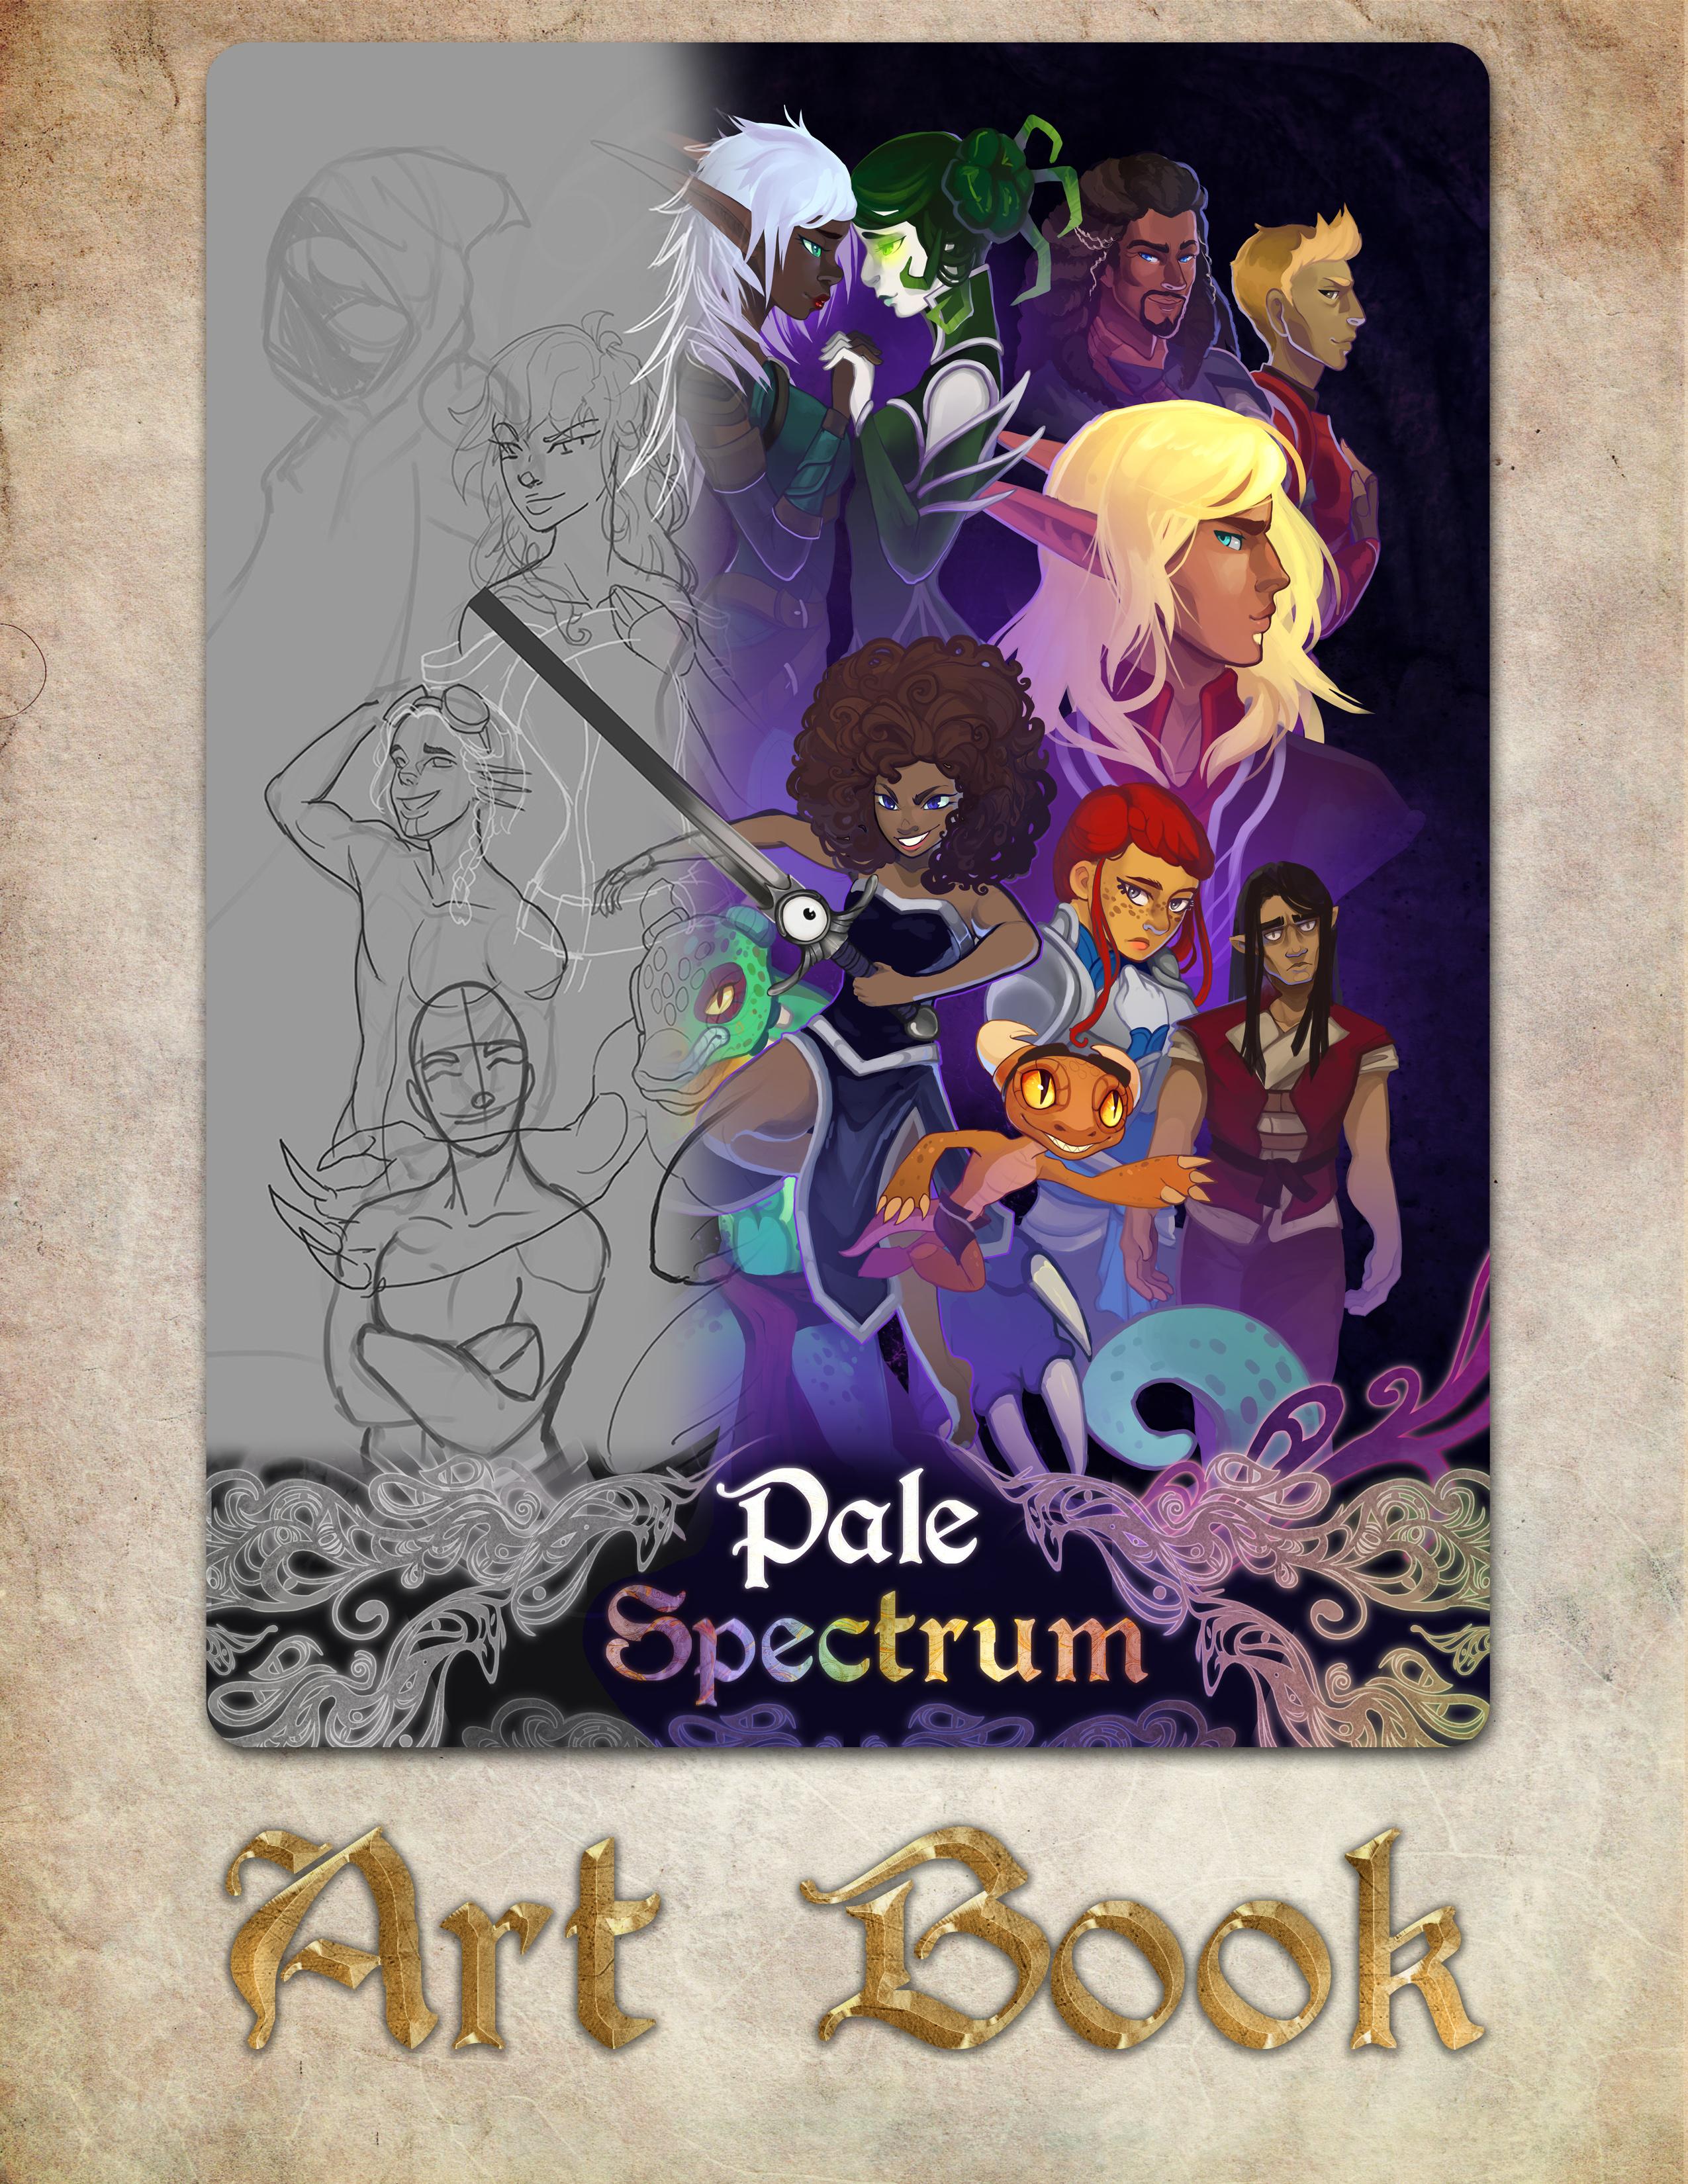 Pale Spectrum - Art Book